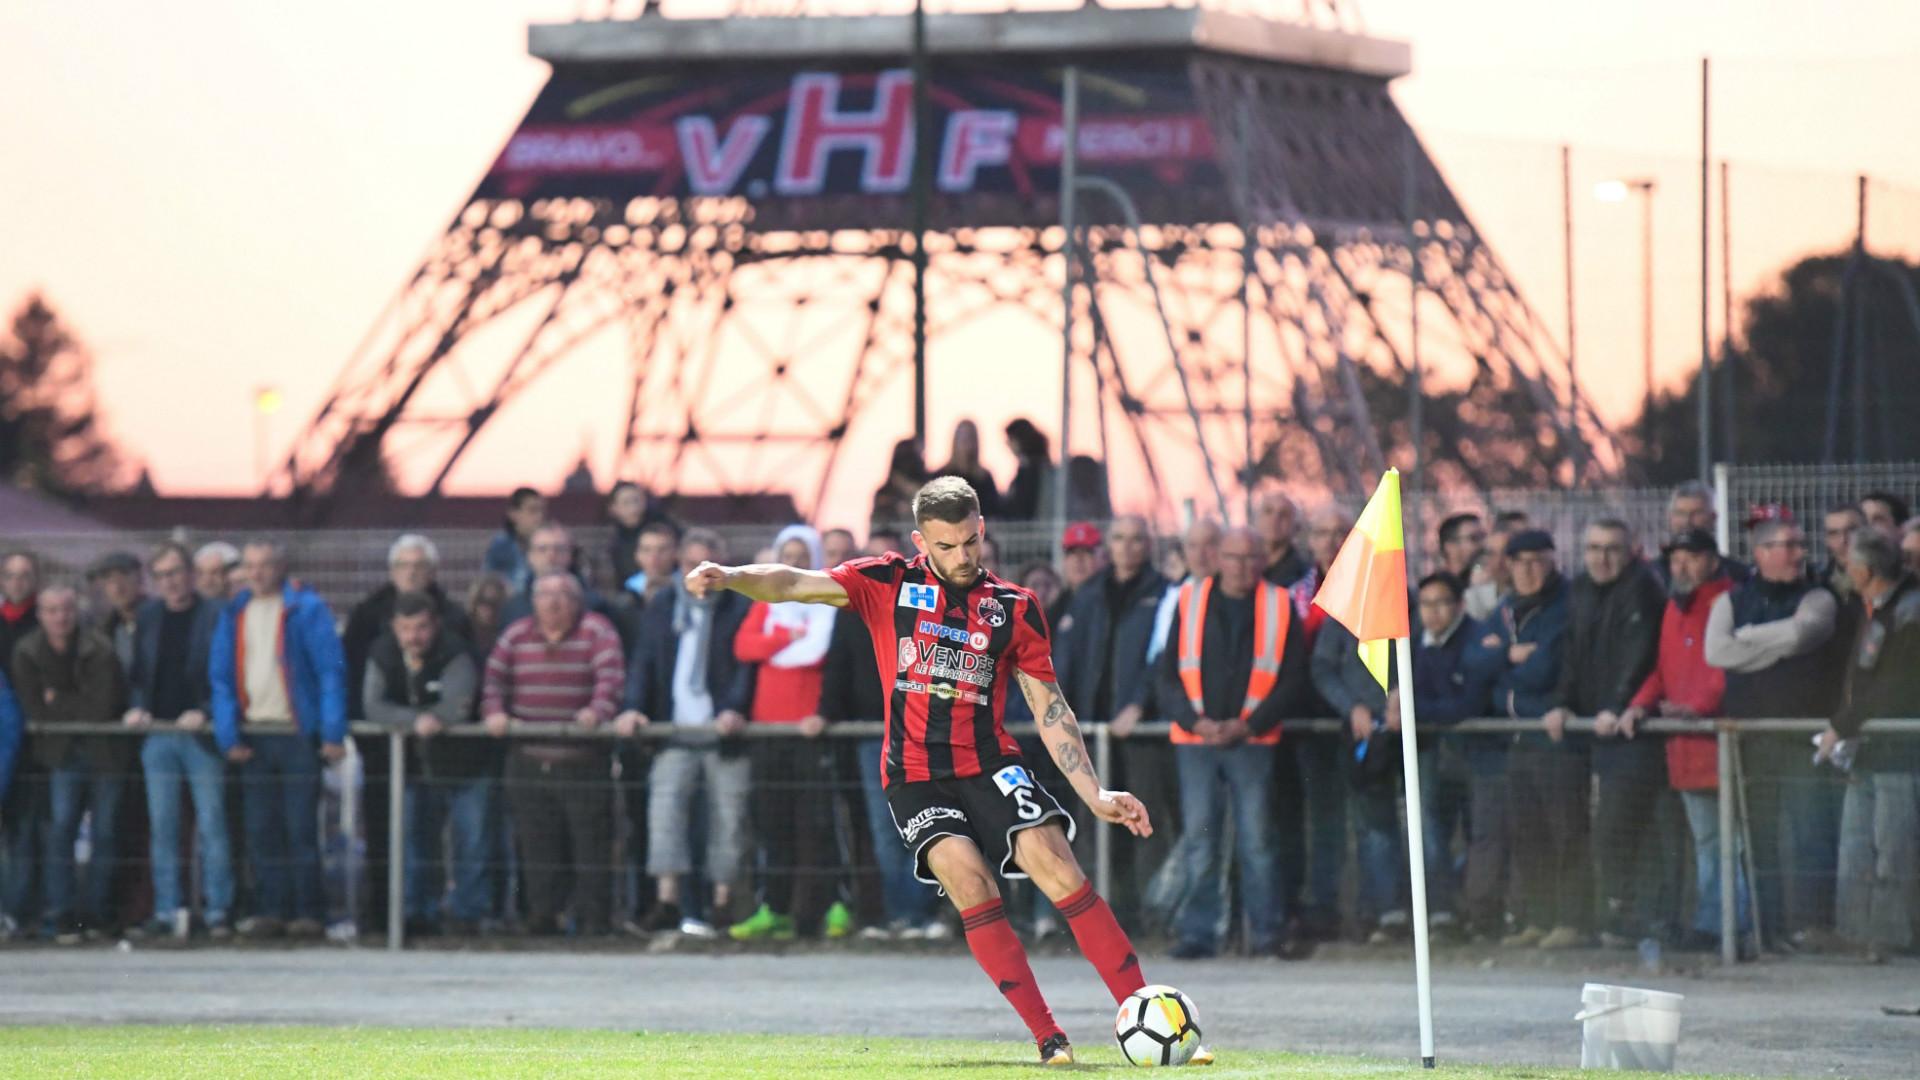 Thiago Silva invites Les Herbiers skipper to lift Coupe de France trophy